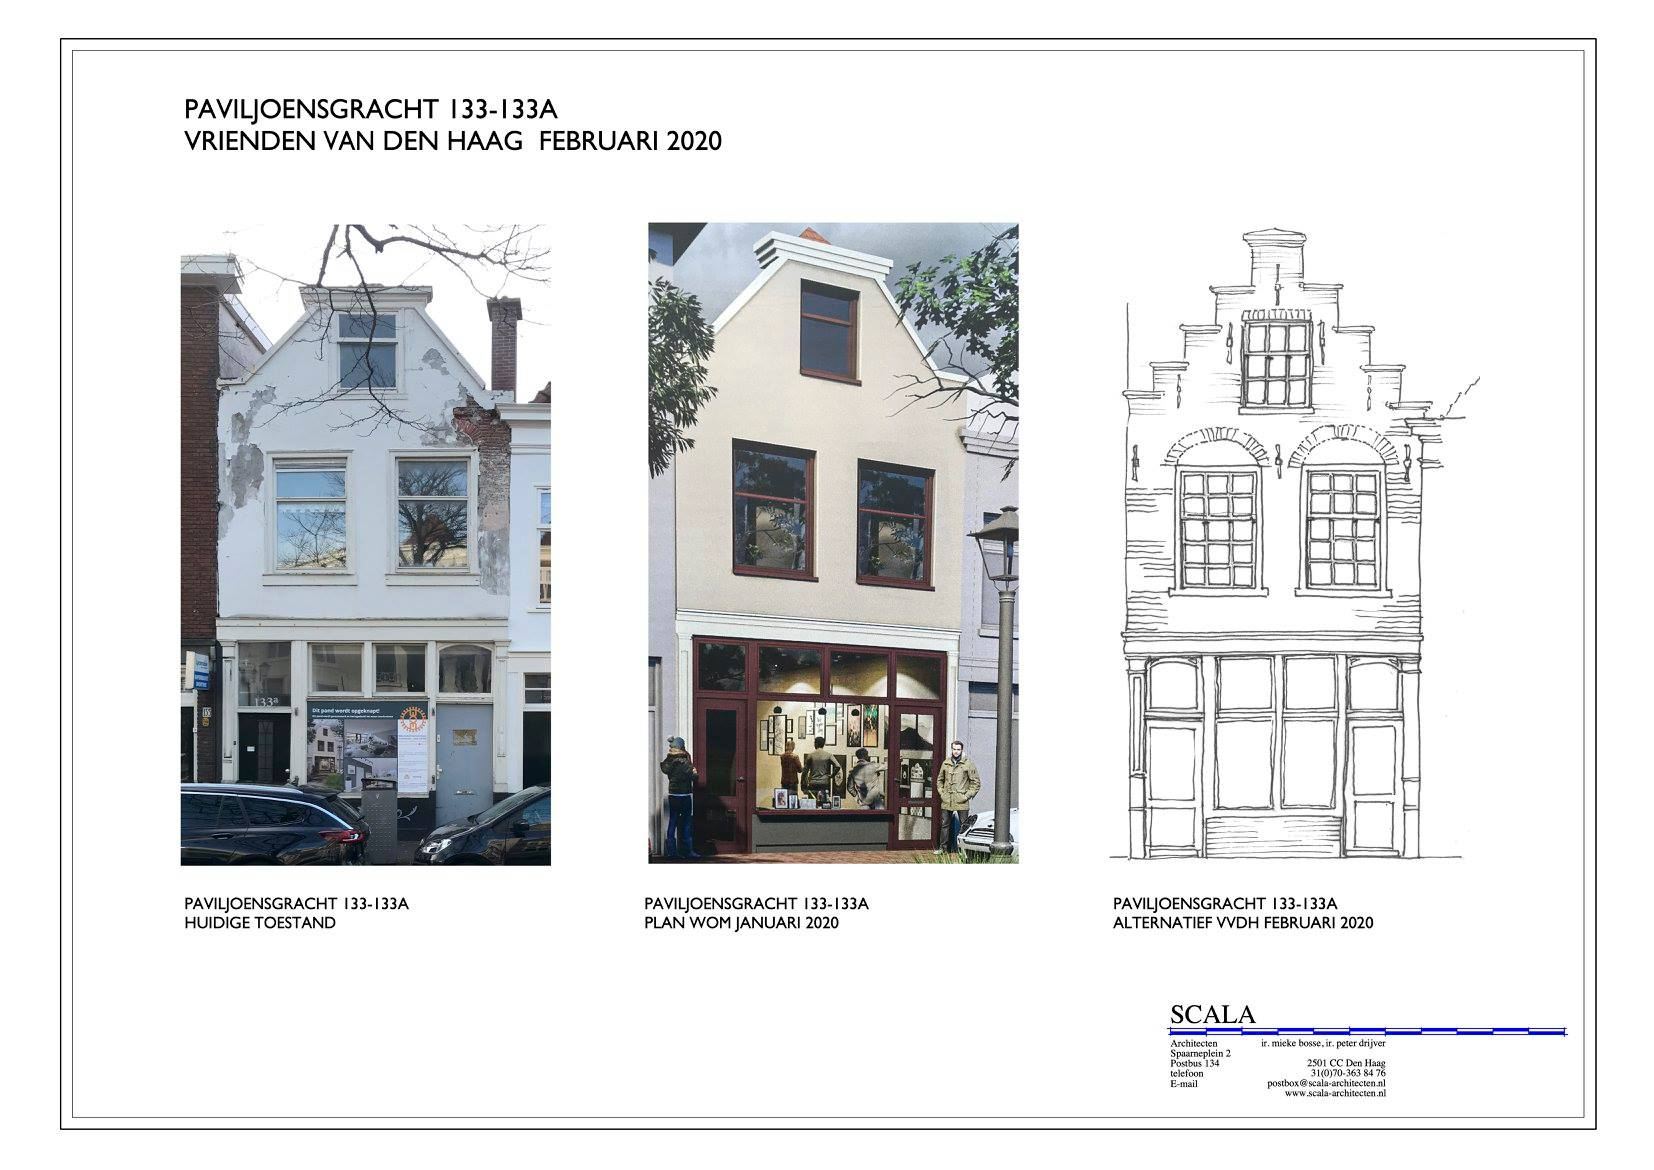 Renovatie pand Paviljoensgracht vraagt actieve bemoeienis Monumentenzorg